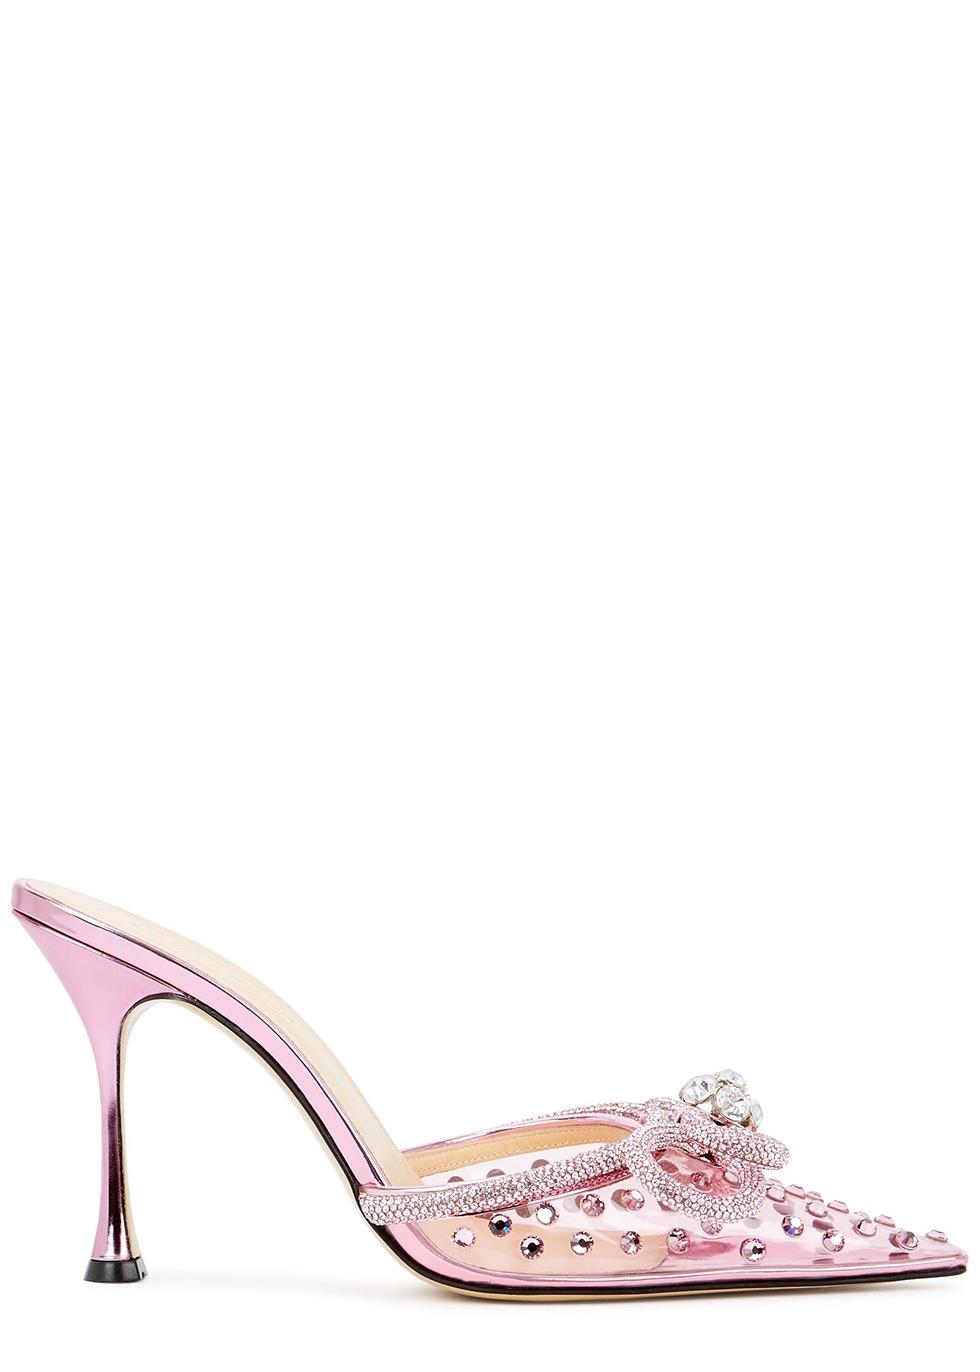 100 pink embellished PVC mules